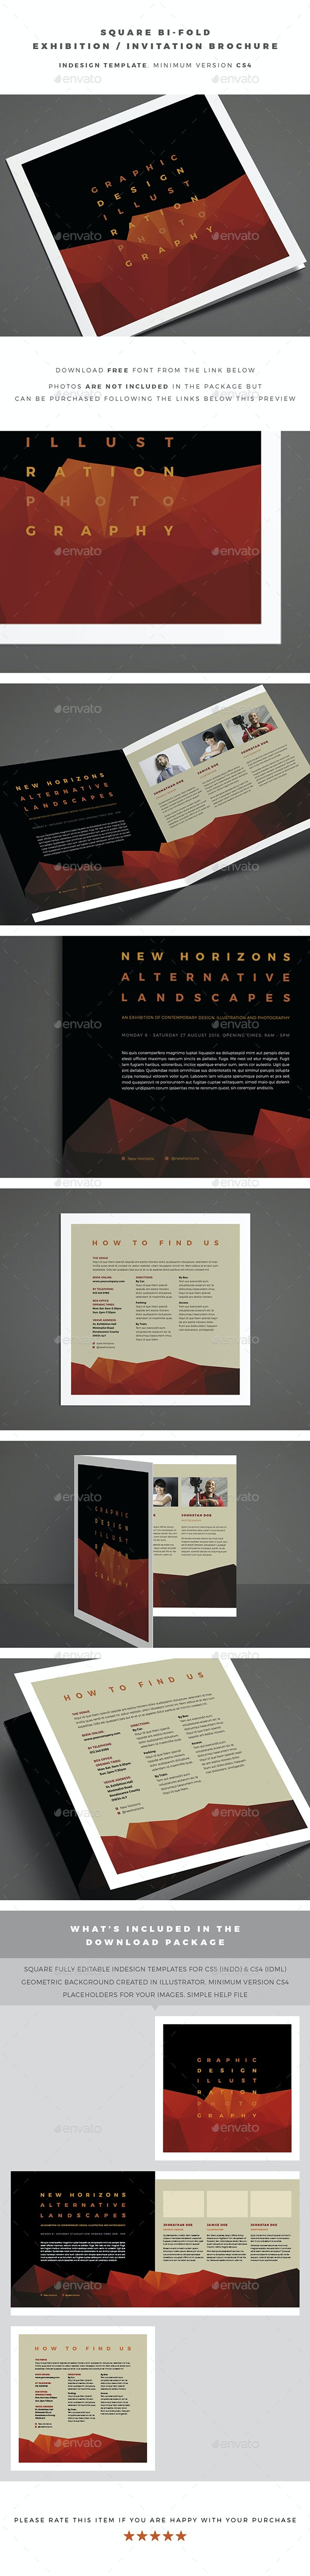 Square Bi-Fold Exhibition / Invitation Brochure - Brochures Print Templates